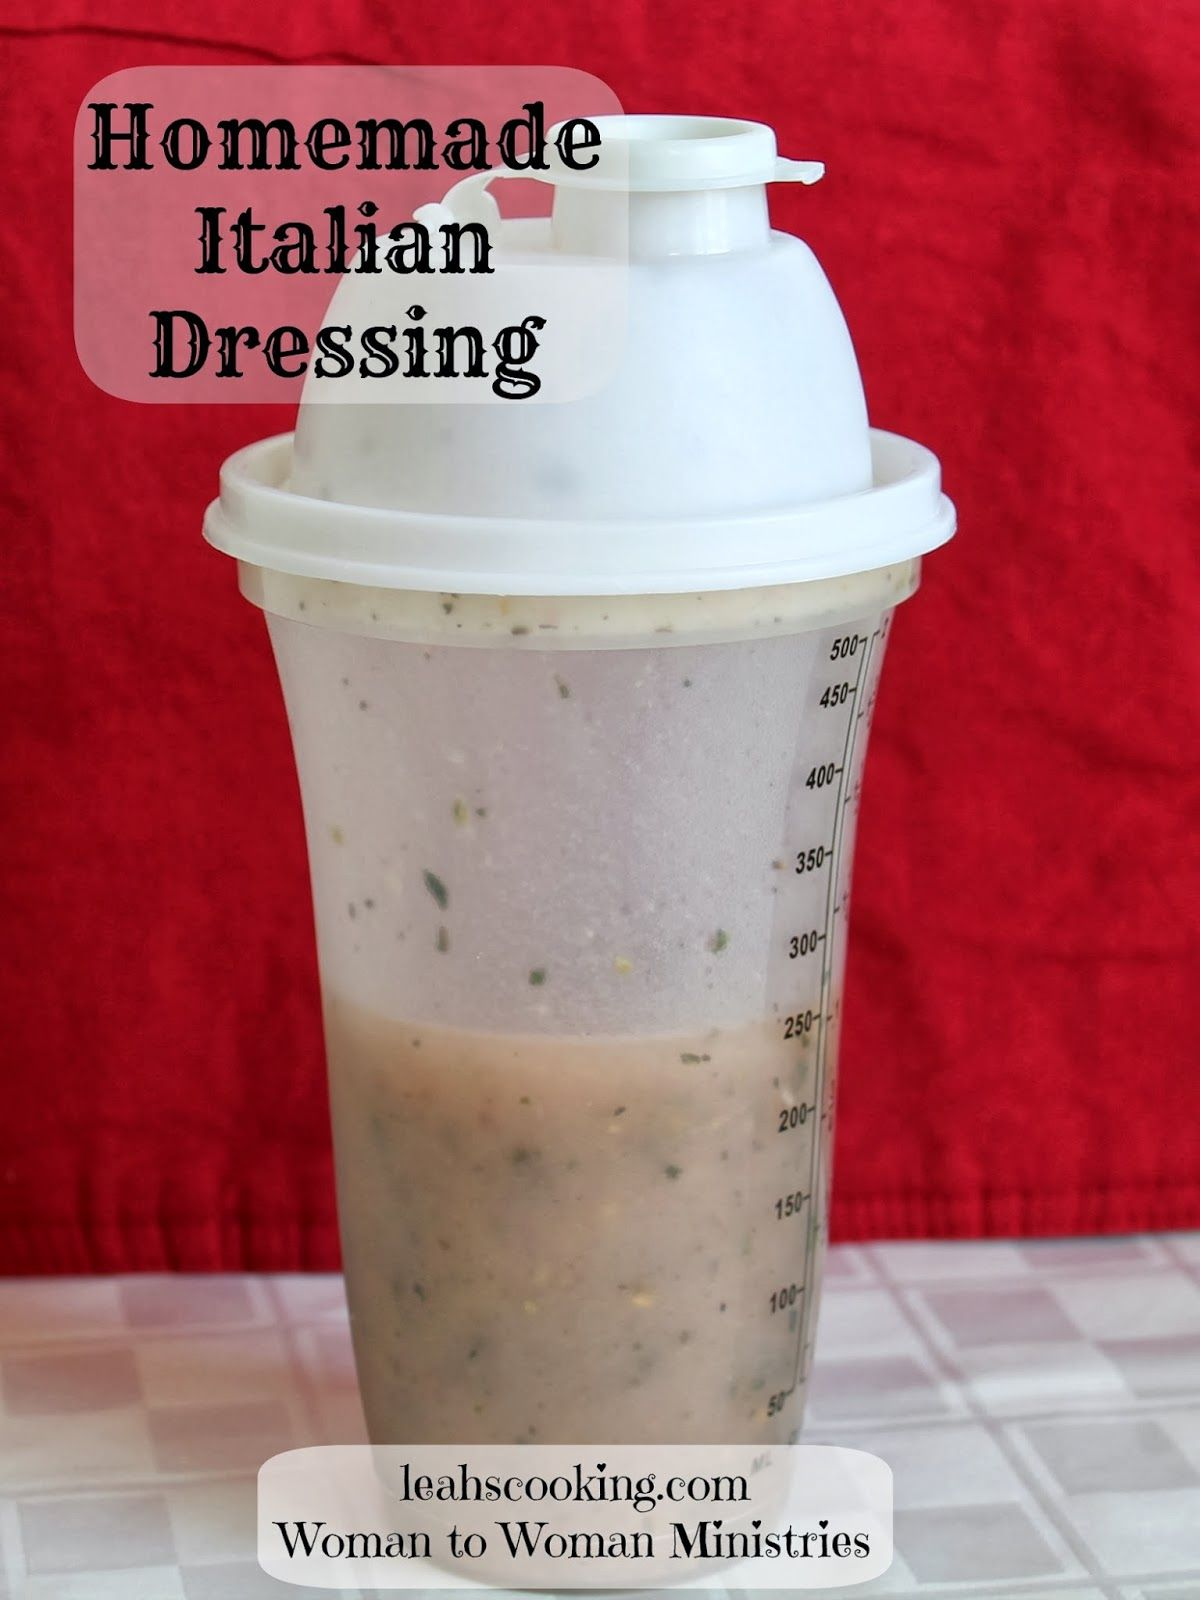 Homemade Italian Dressing Homemade Italian Dressing Italian Dressing Homemade Italian